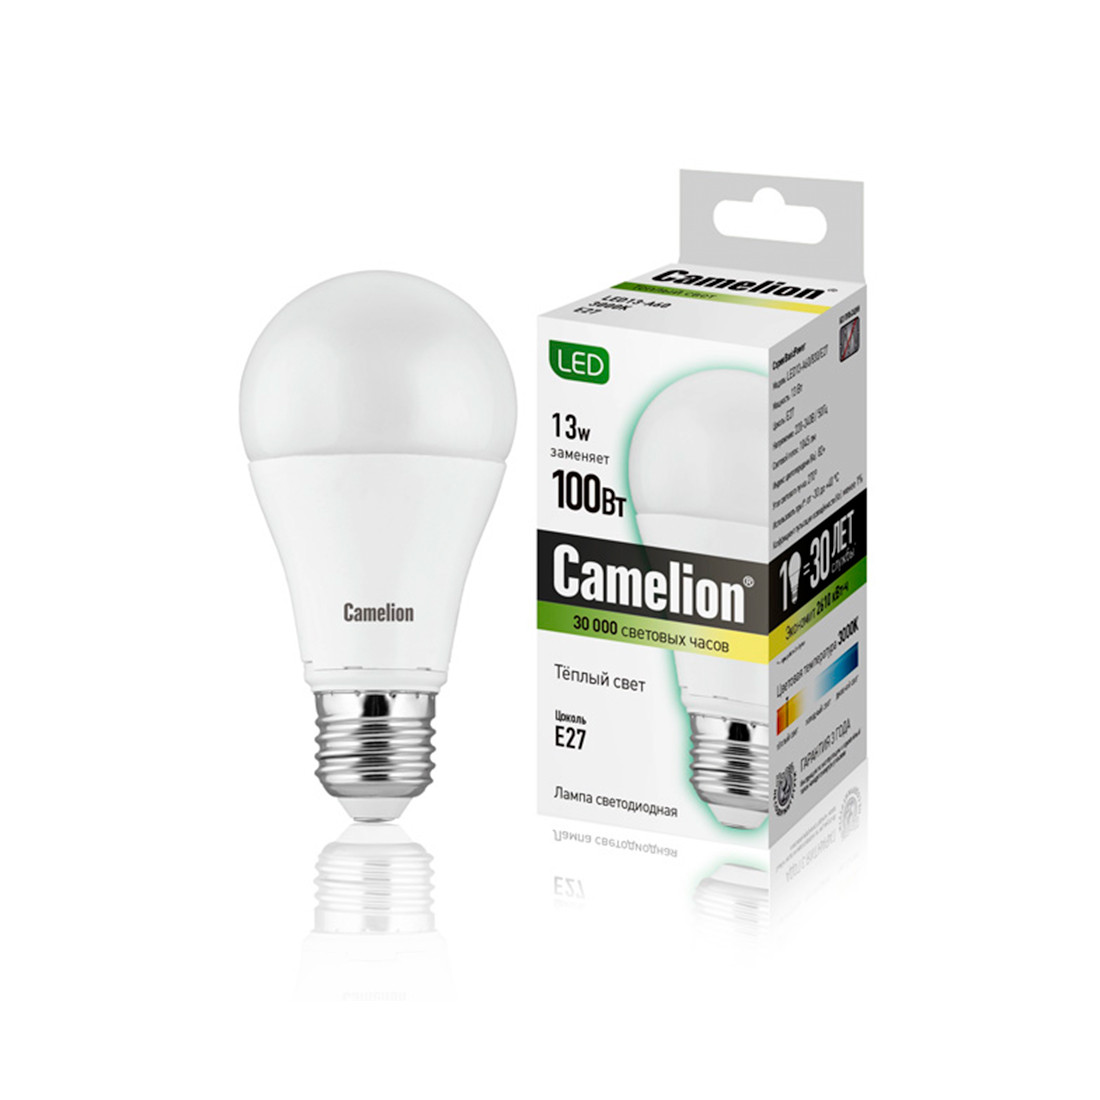 Лампа светодиодная Camelion А60/3000К/E27/13Вт, Тёплый